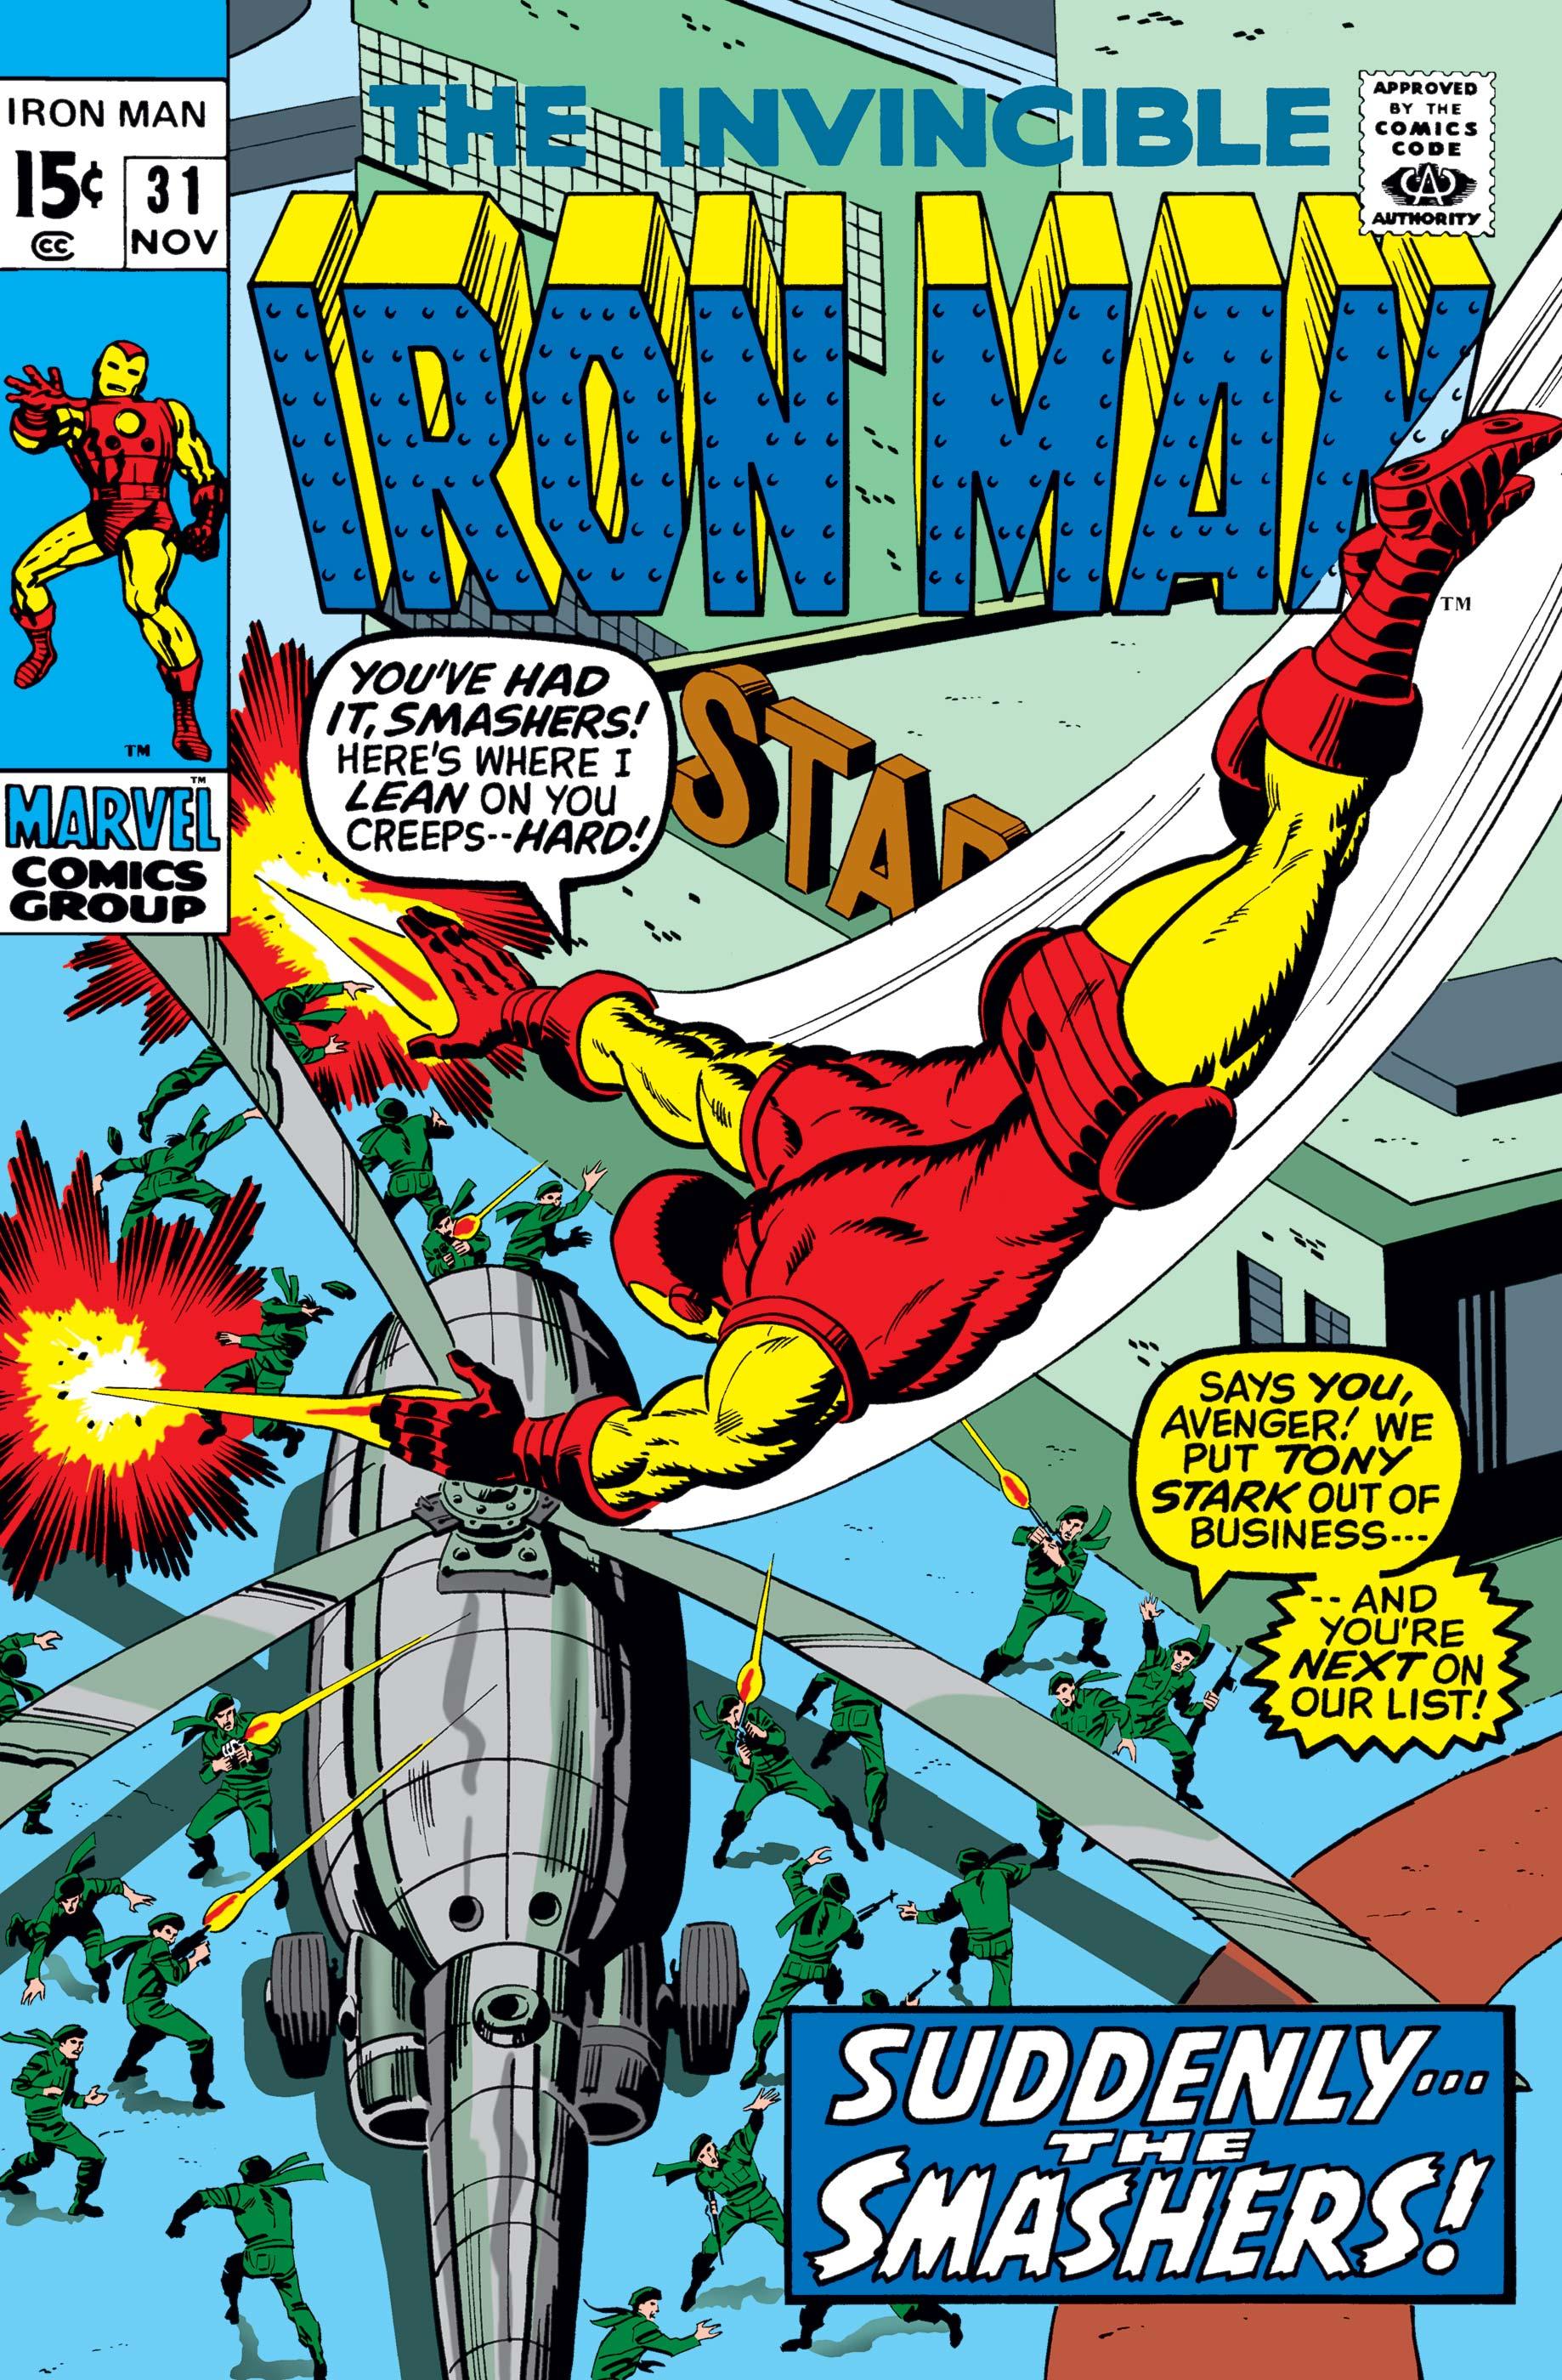 Iron Man (1968) #31